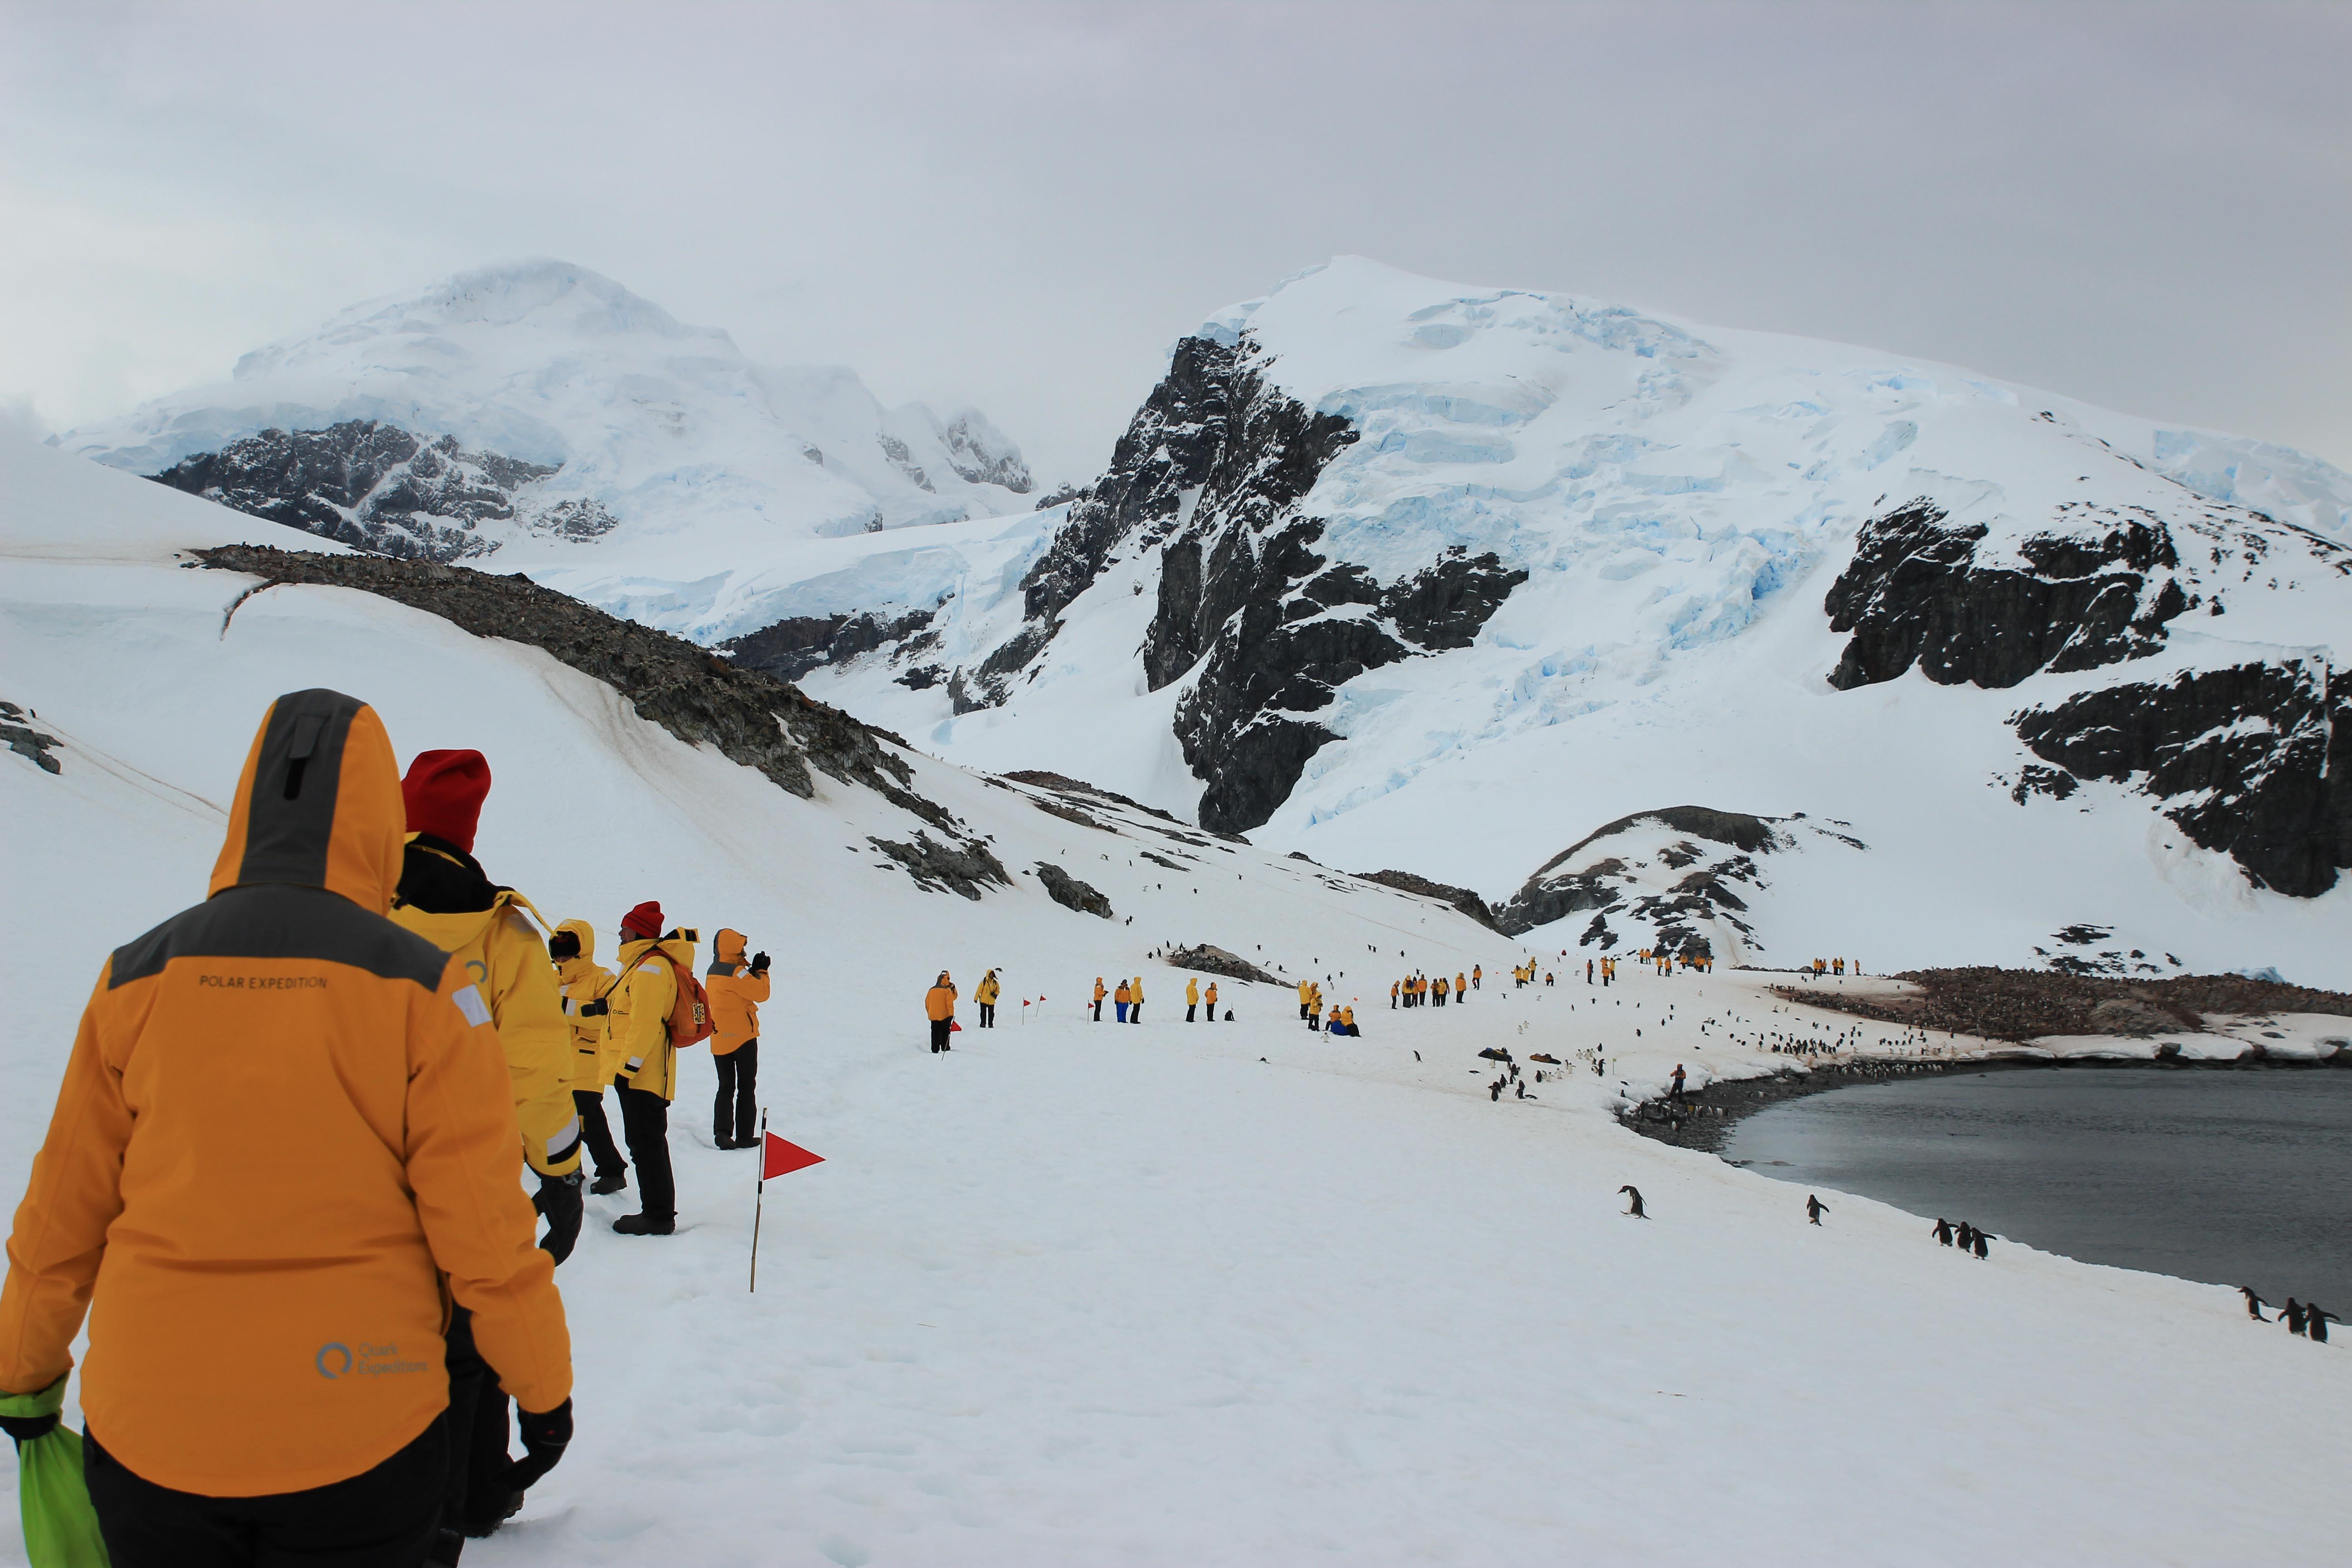 Quark Expeditions Wins Gold Magellan Award For Antarctica